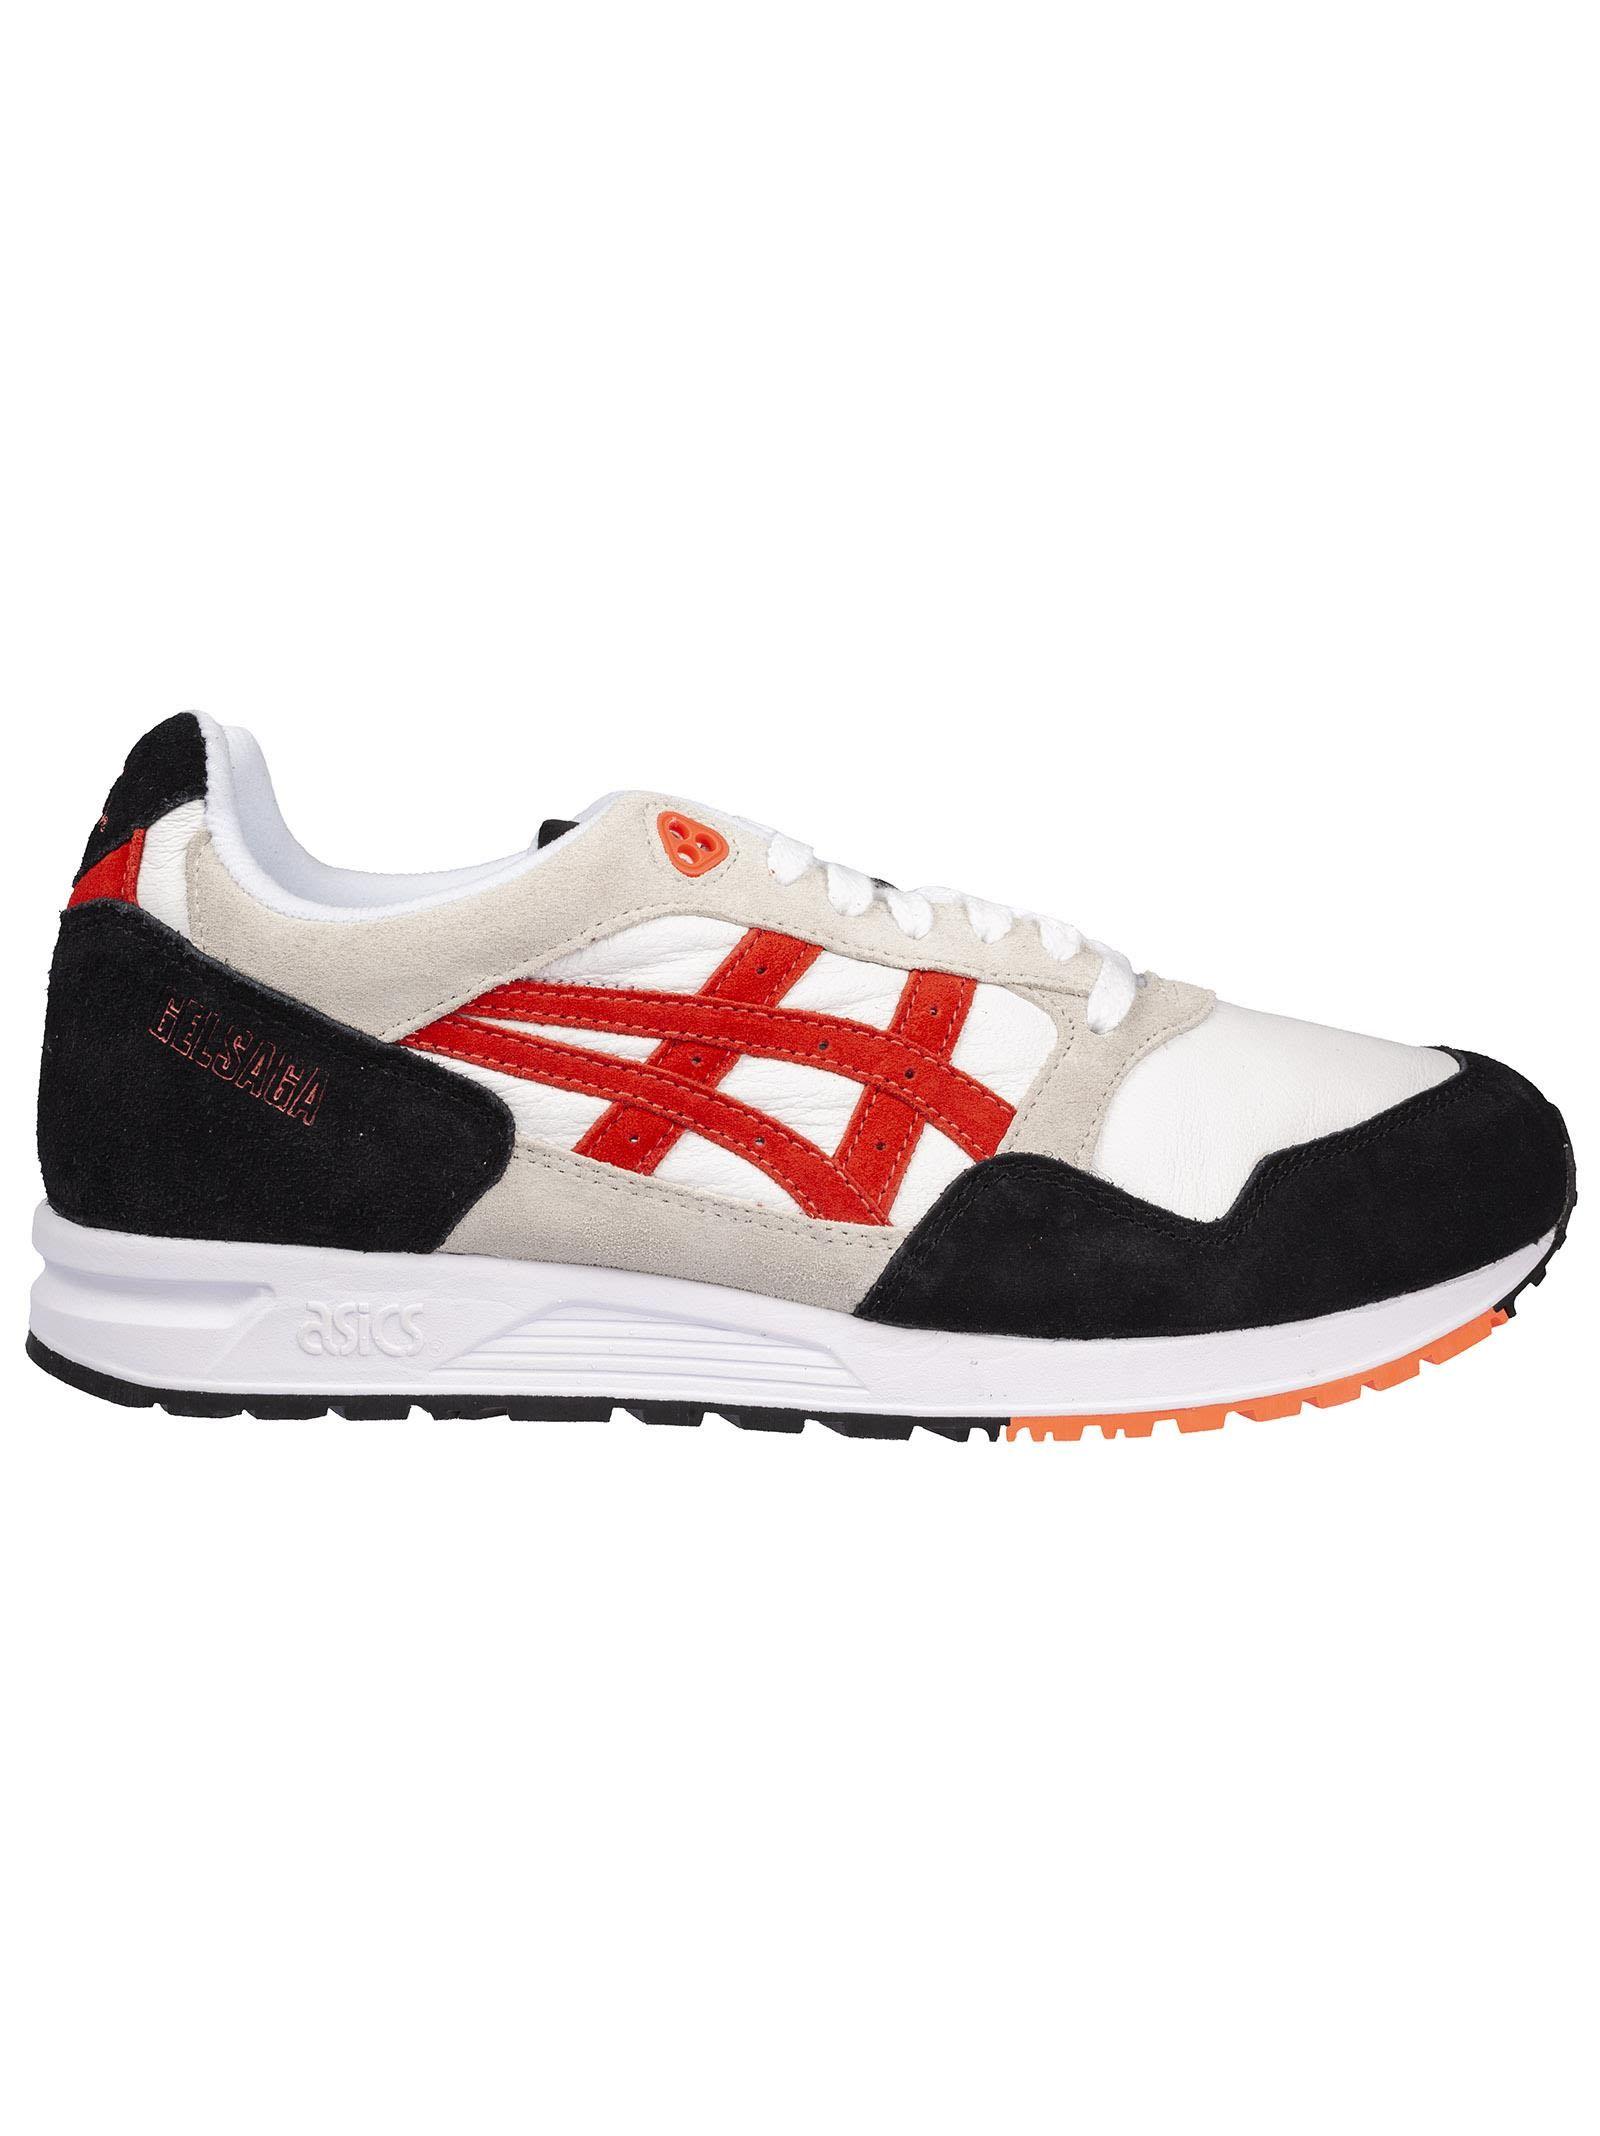 ASICS Gel Vickka Low Profile Sneaker. #asics #shoes | Asics